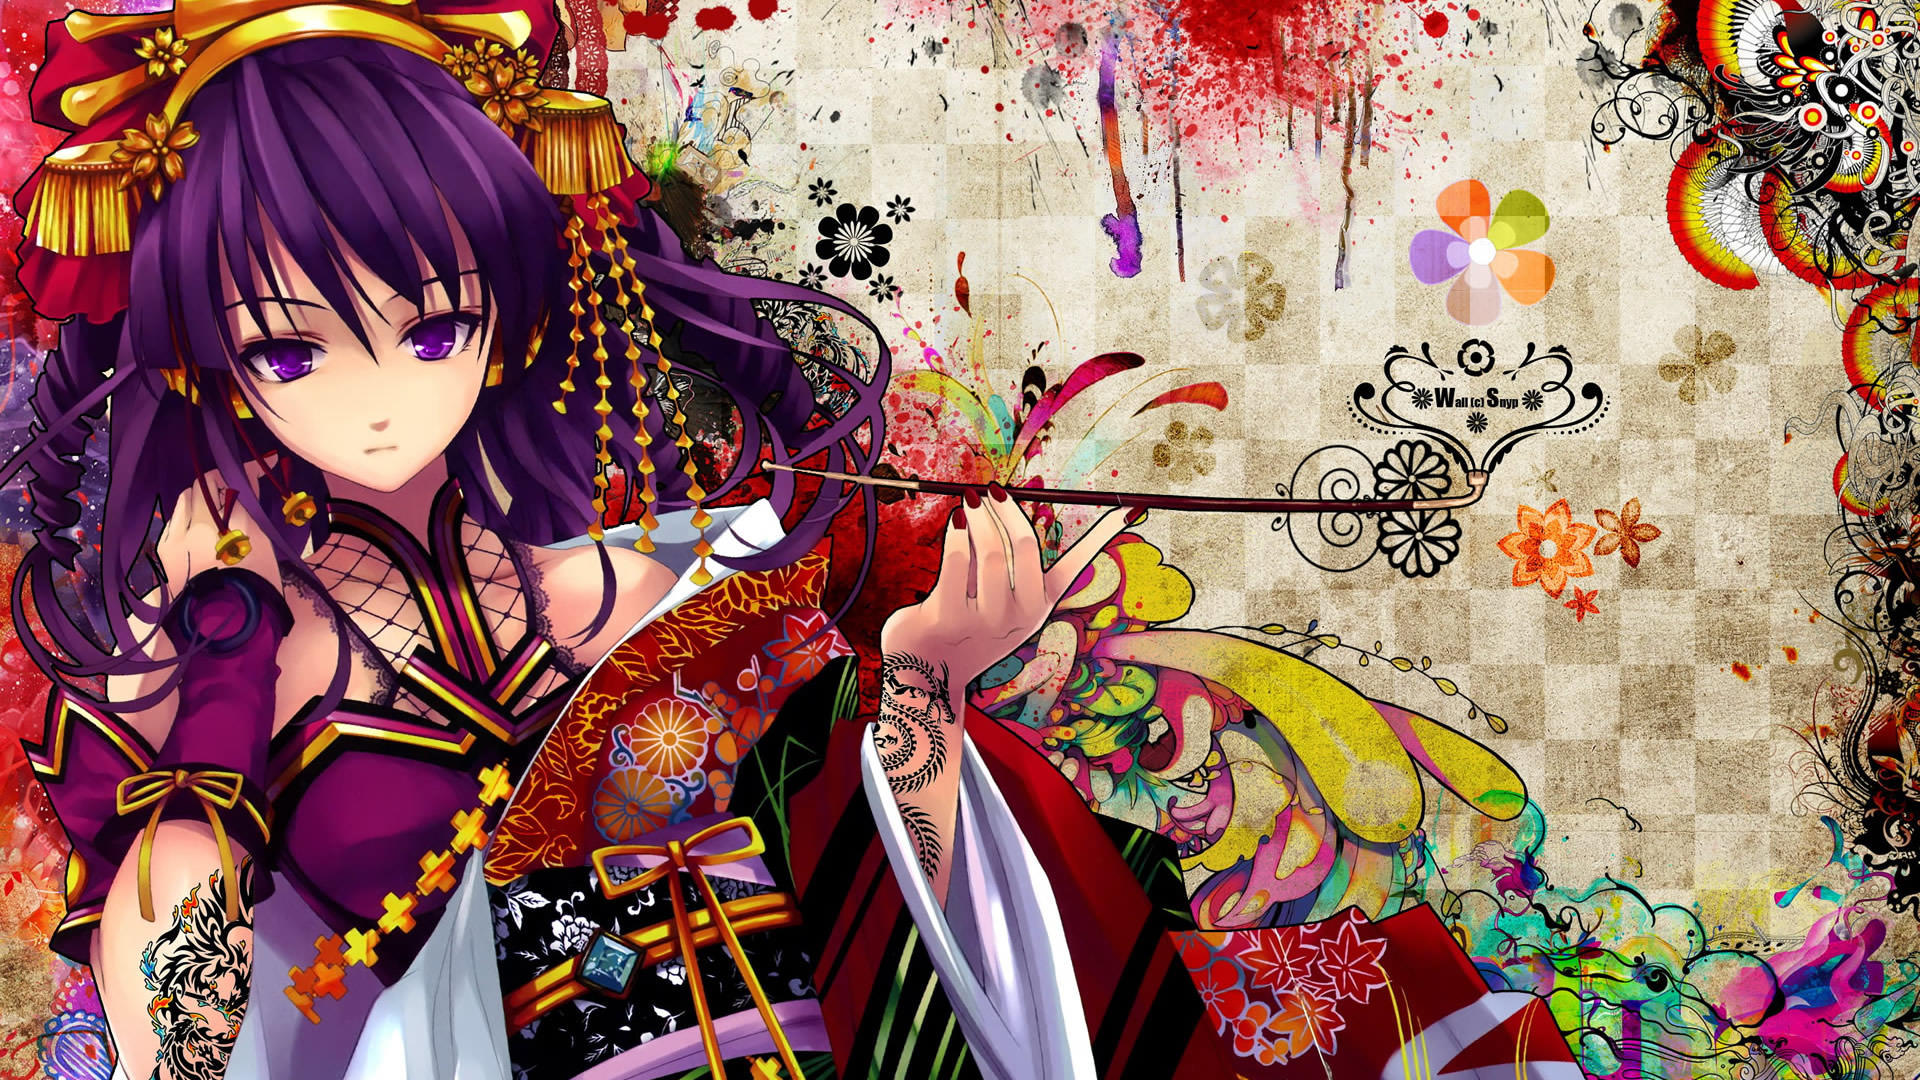 Manga Wallpaper 1920x1080 1920x1080